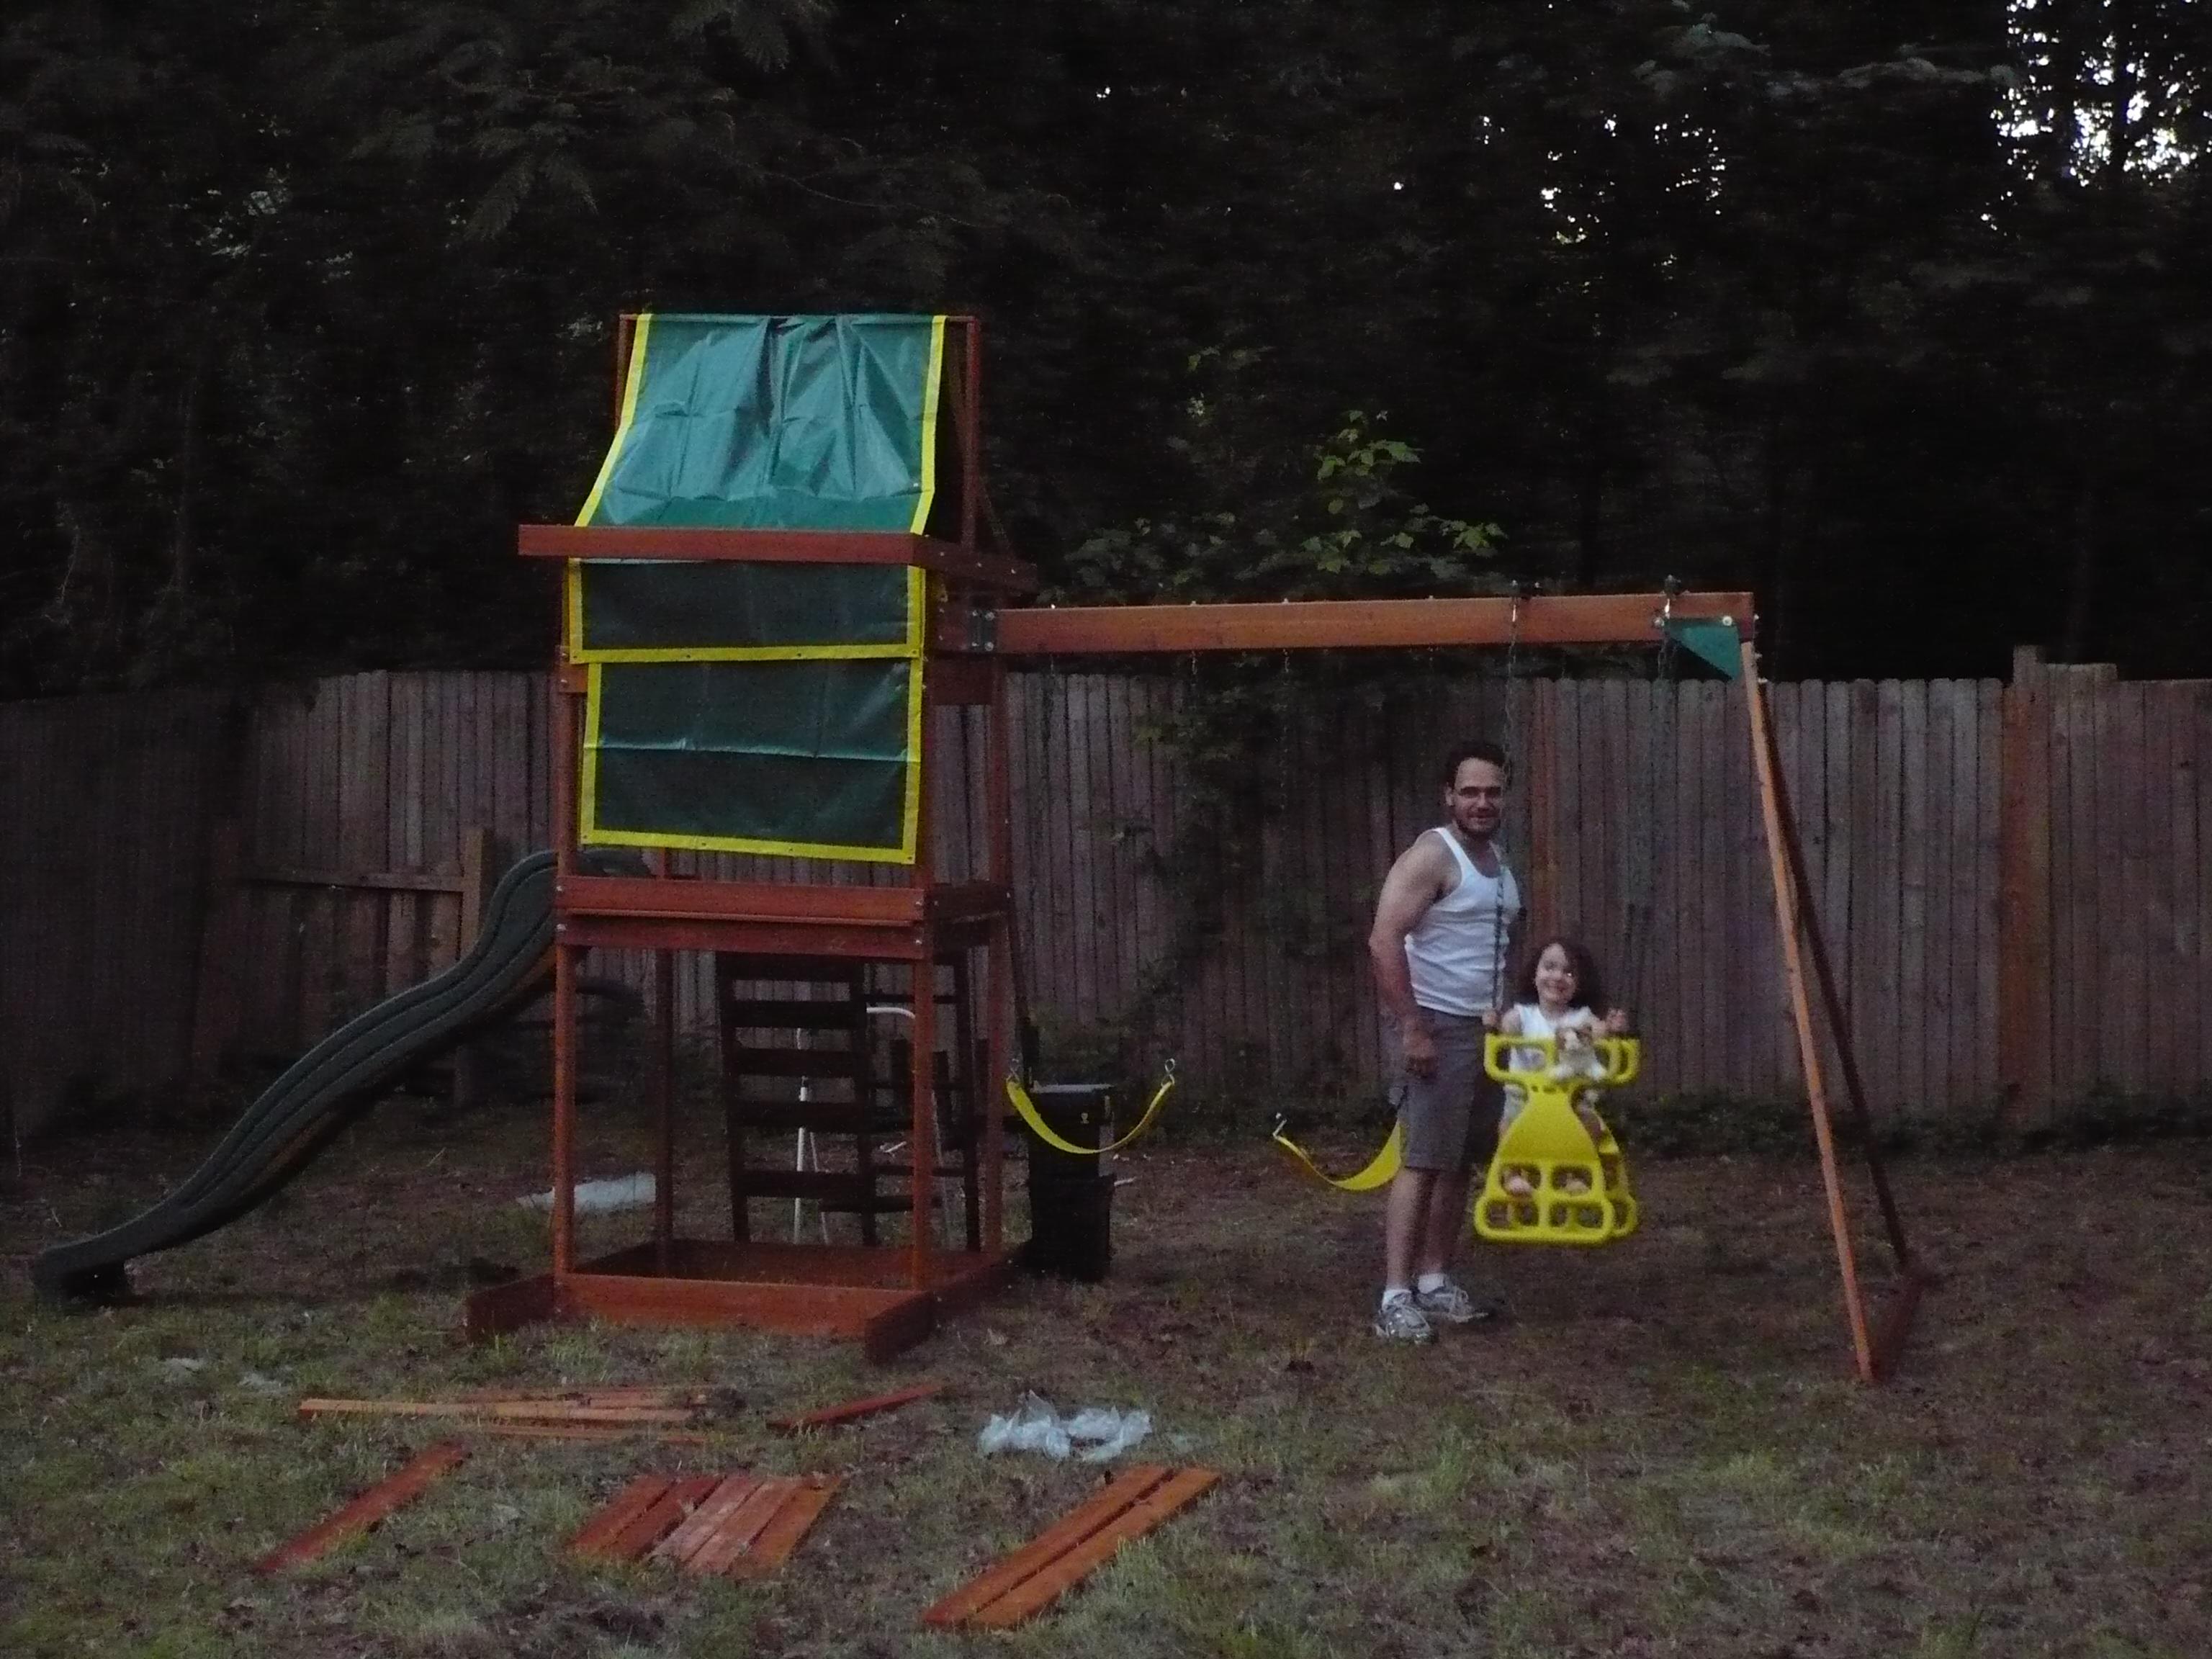 Daddy and Sasha on the new swing set